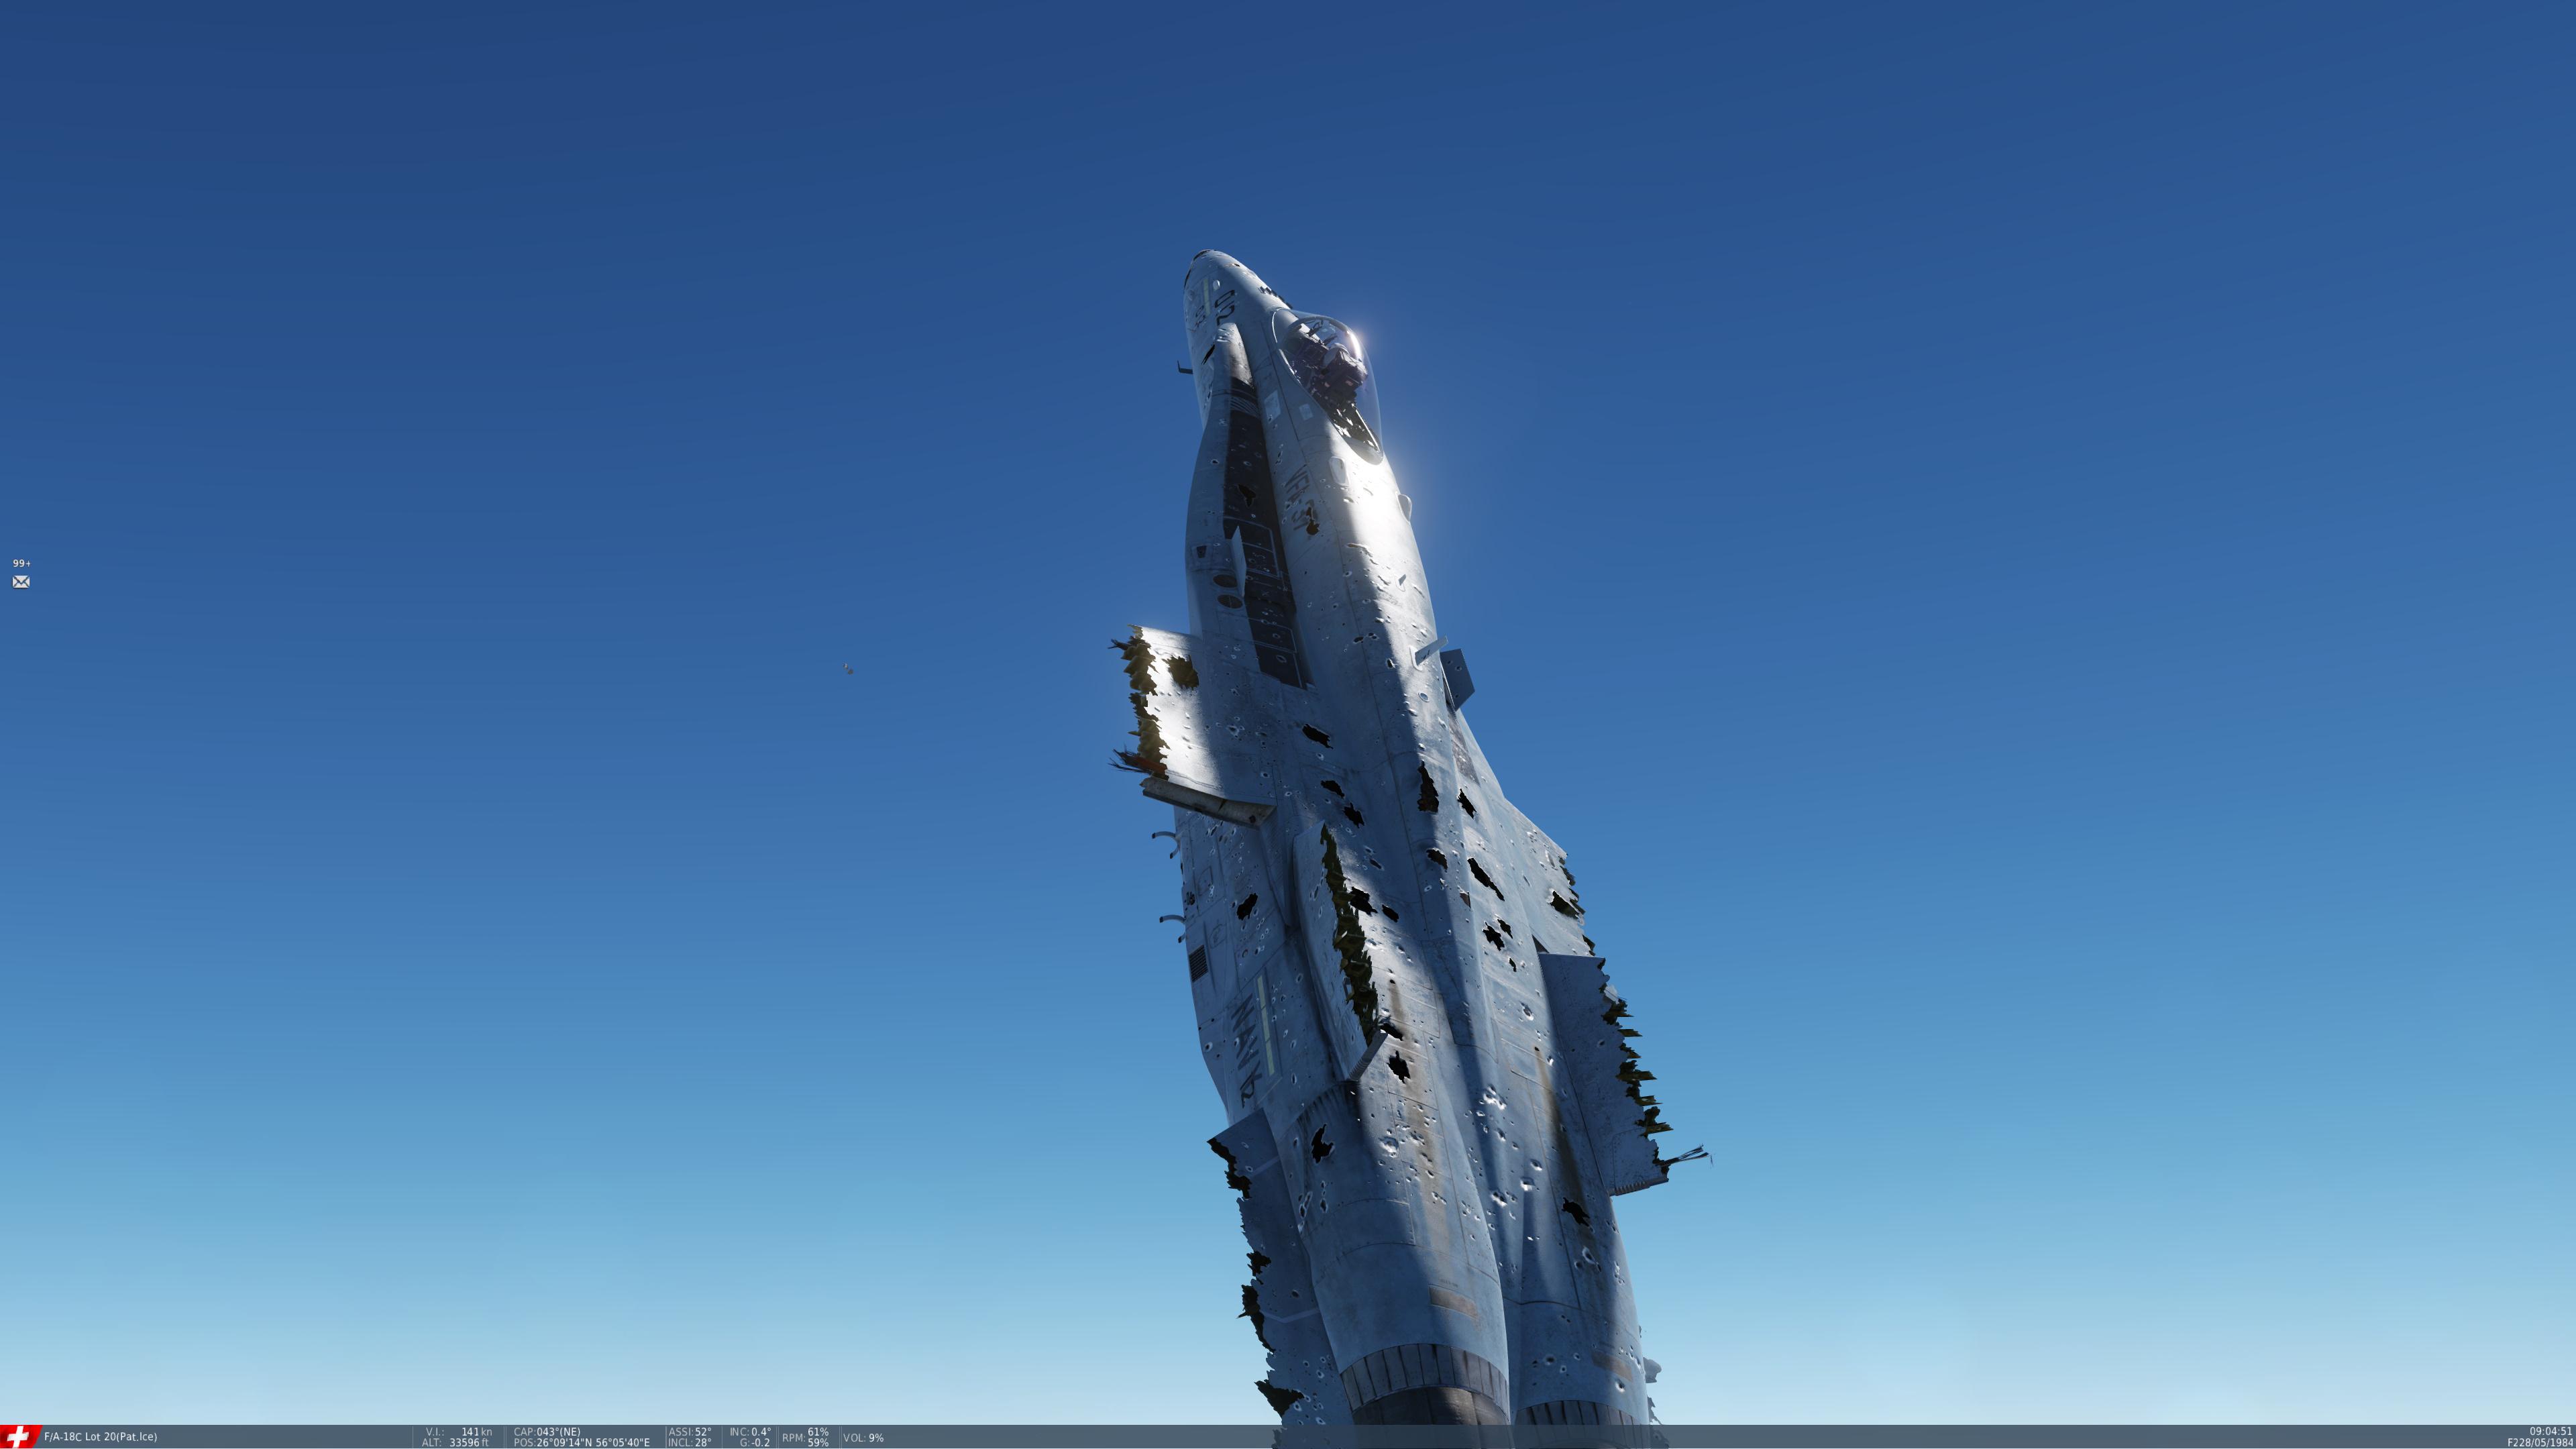 [Cursus UH-1H Huey] Photos de nos missions Bandicam_2021-01-26_23-11-41-676